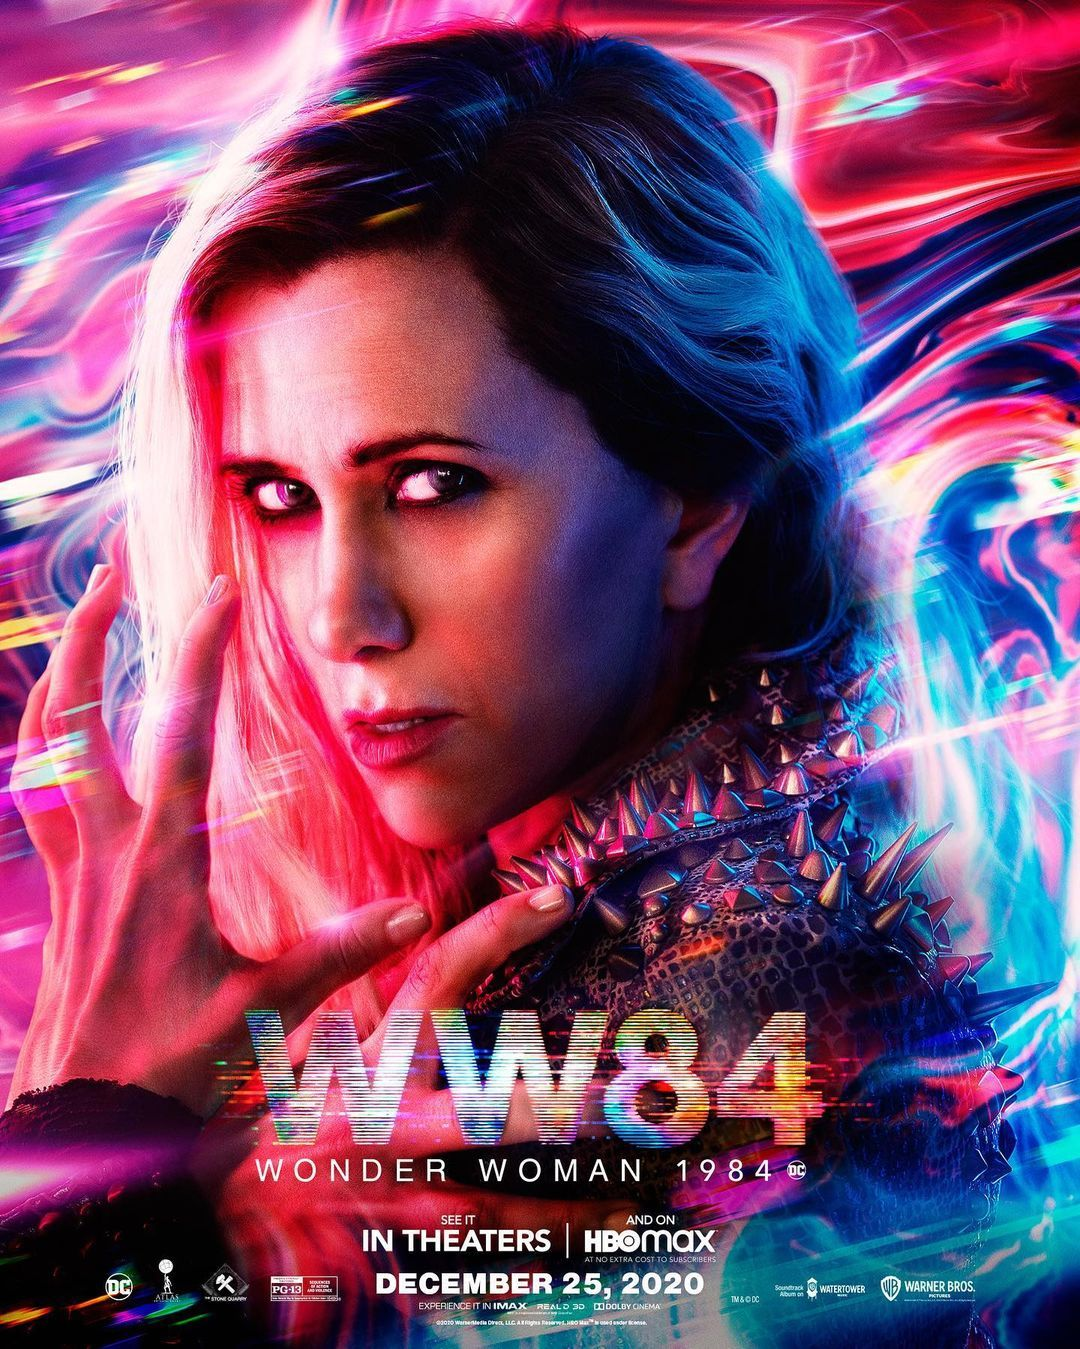 Mulher-Maravilha 1984 | Warner Bros Pictures divulga novos pôsteres individuais